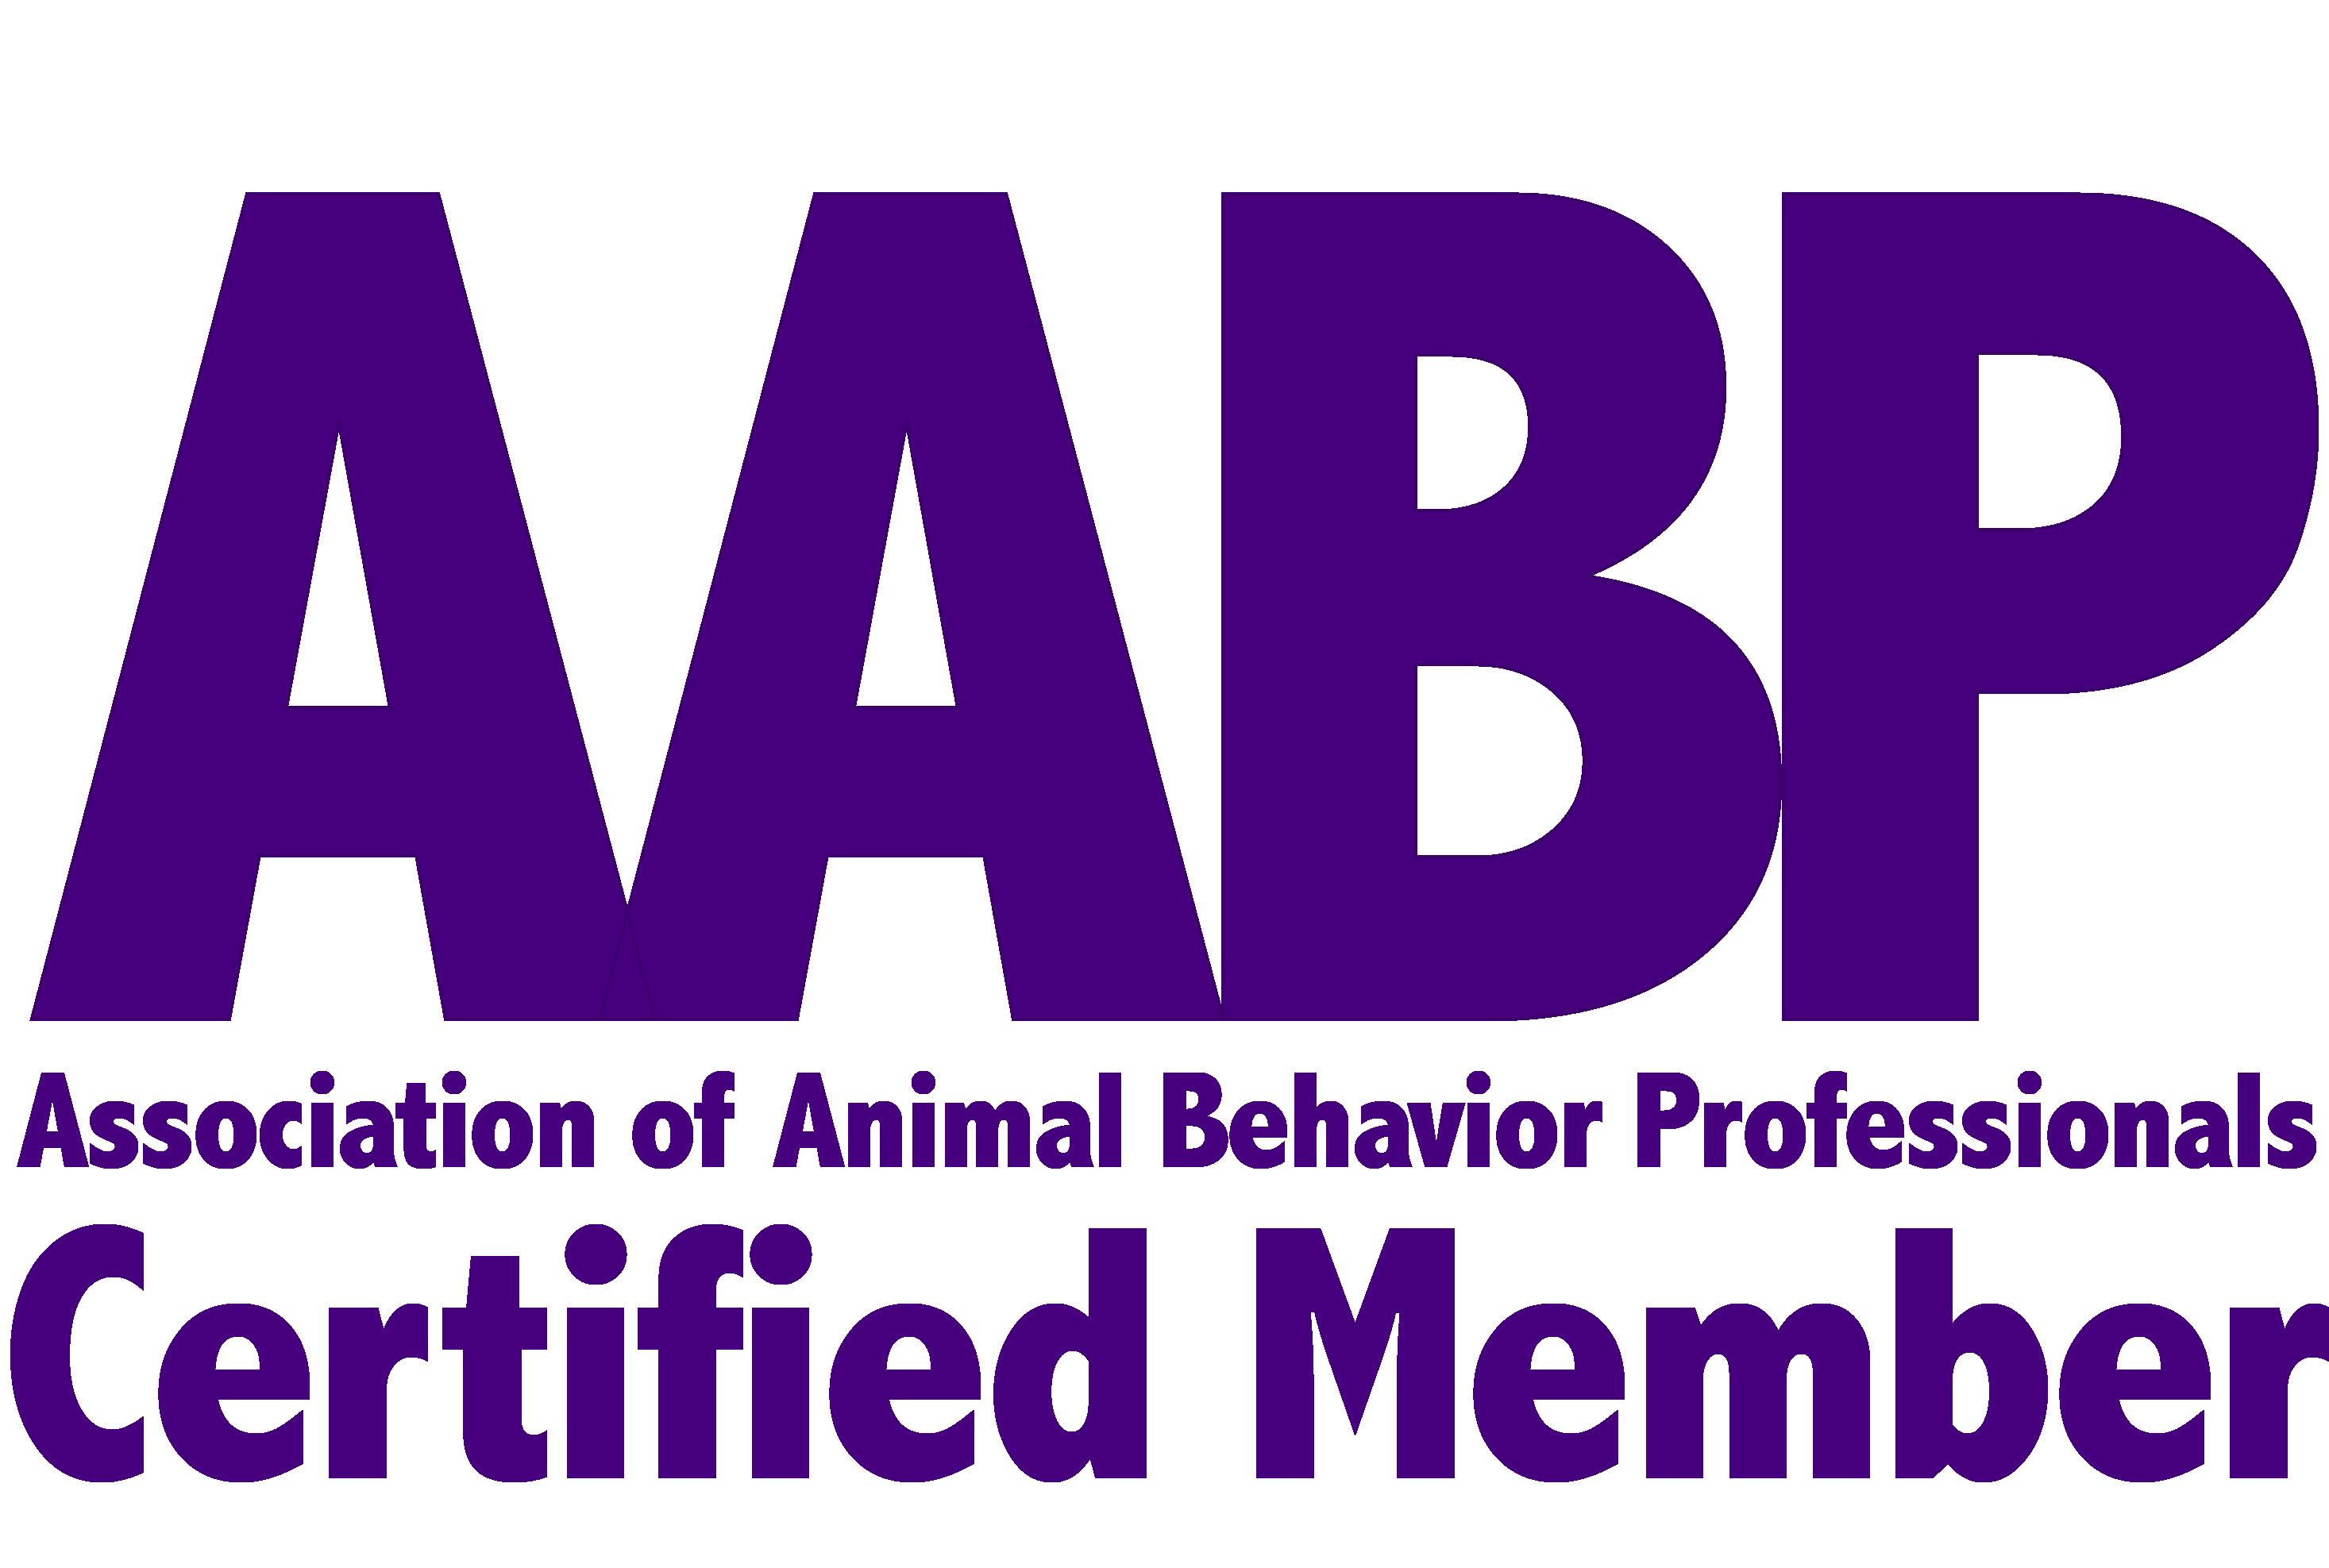 Certified Dog Trainer Association of Animal Behavior Professionals (AABP-CDT)